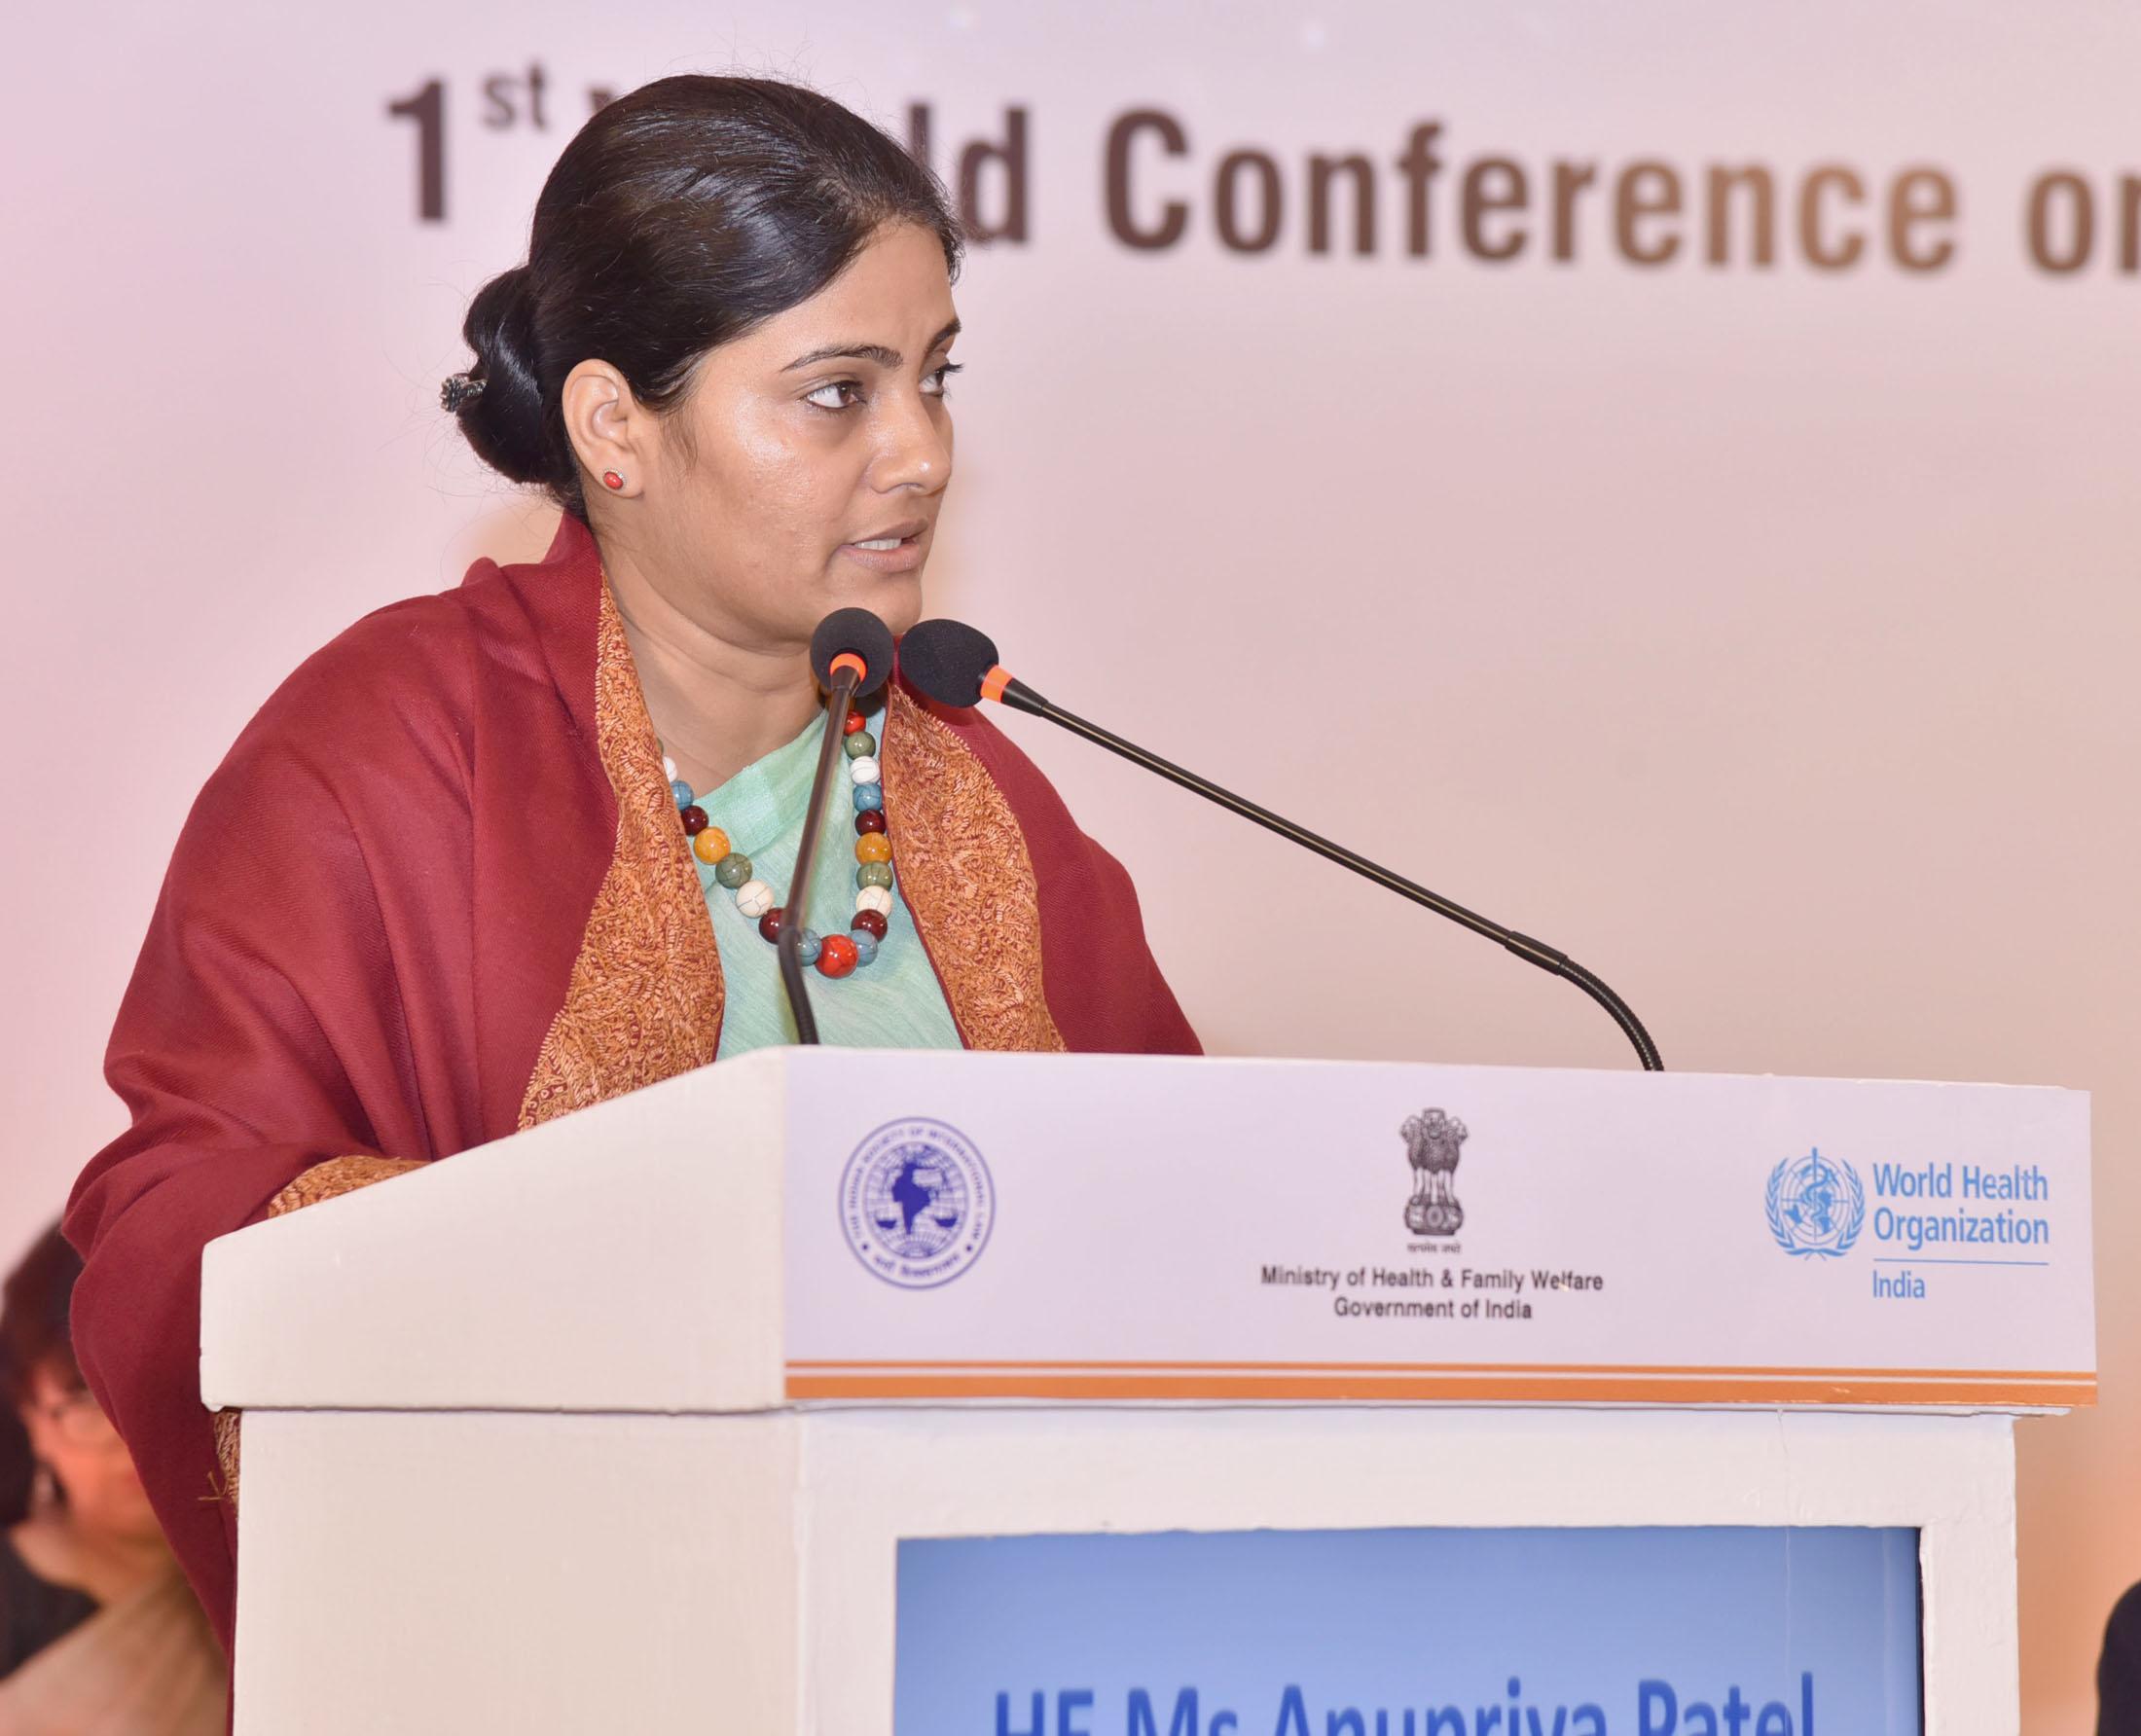 File:Anupriya Patel addressing the '1st World Conference on Access